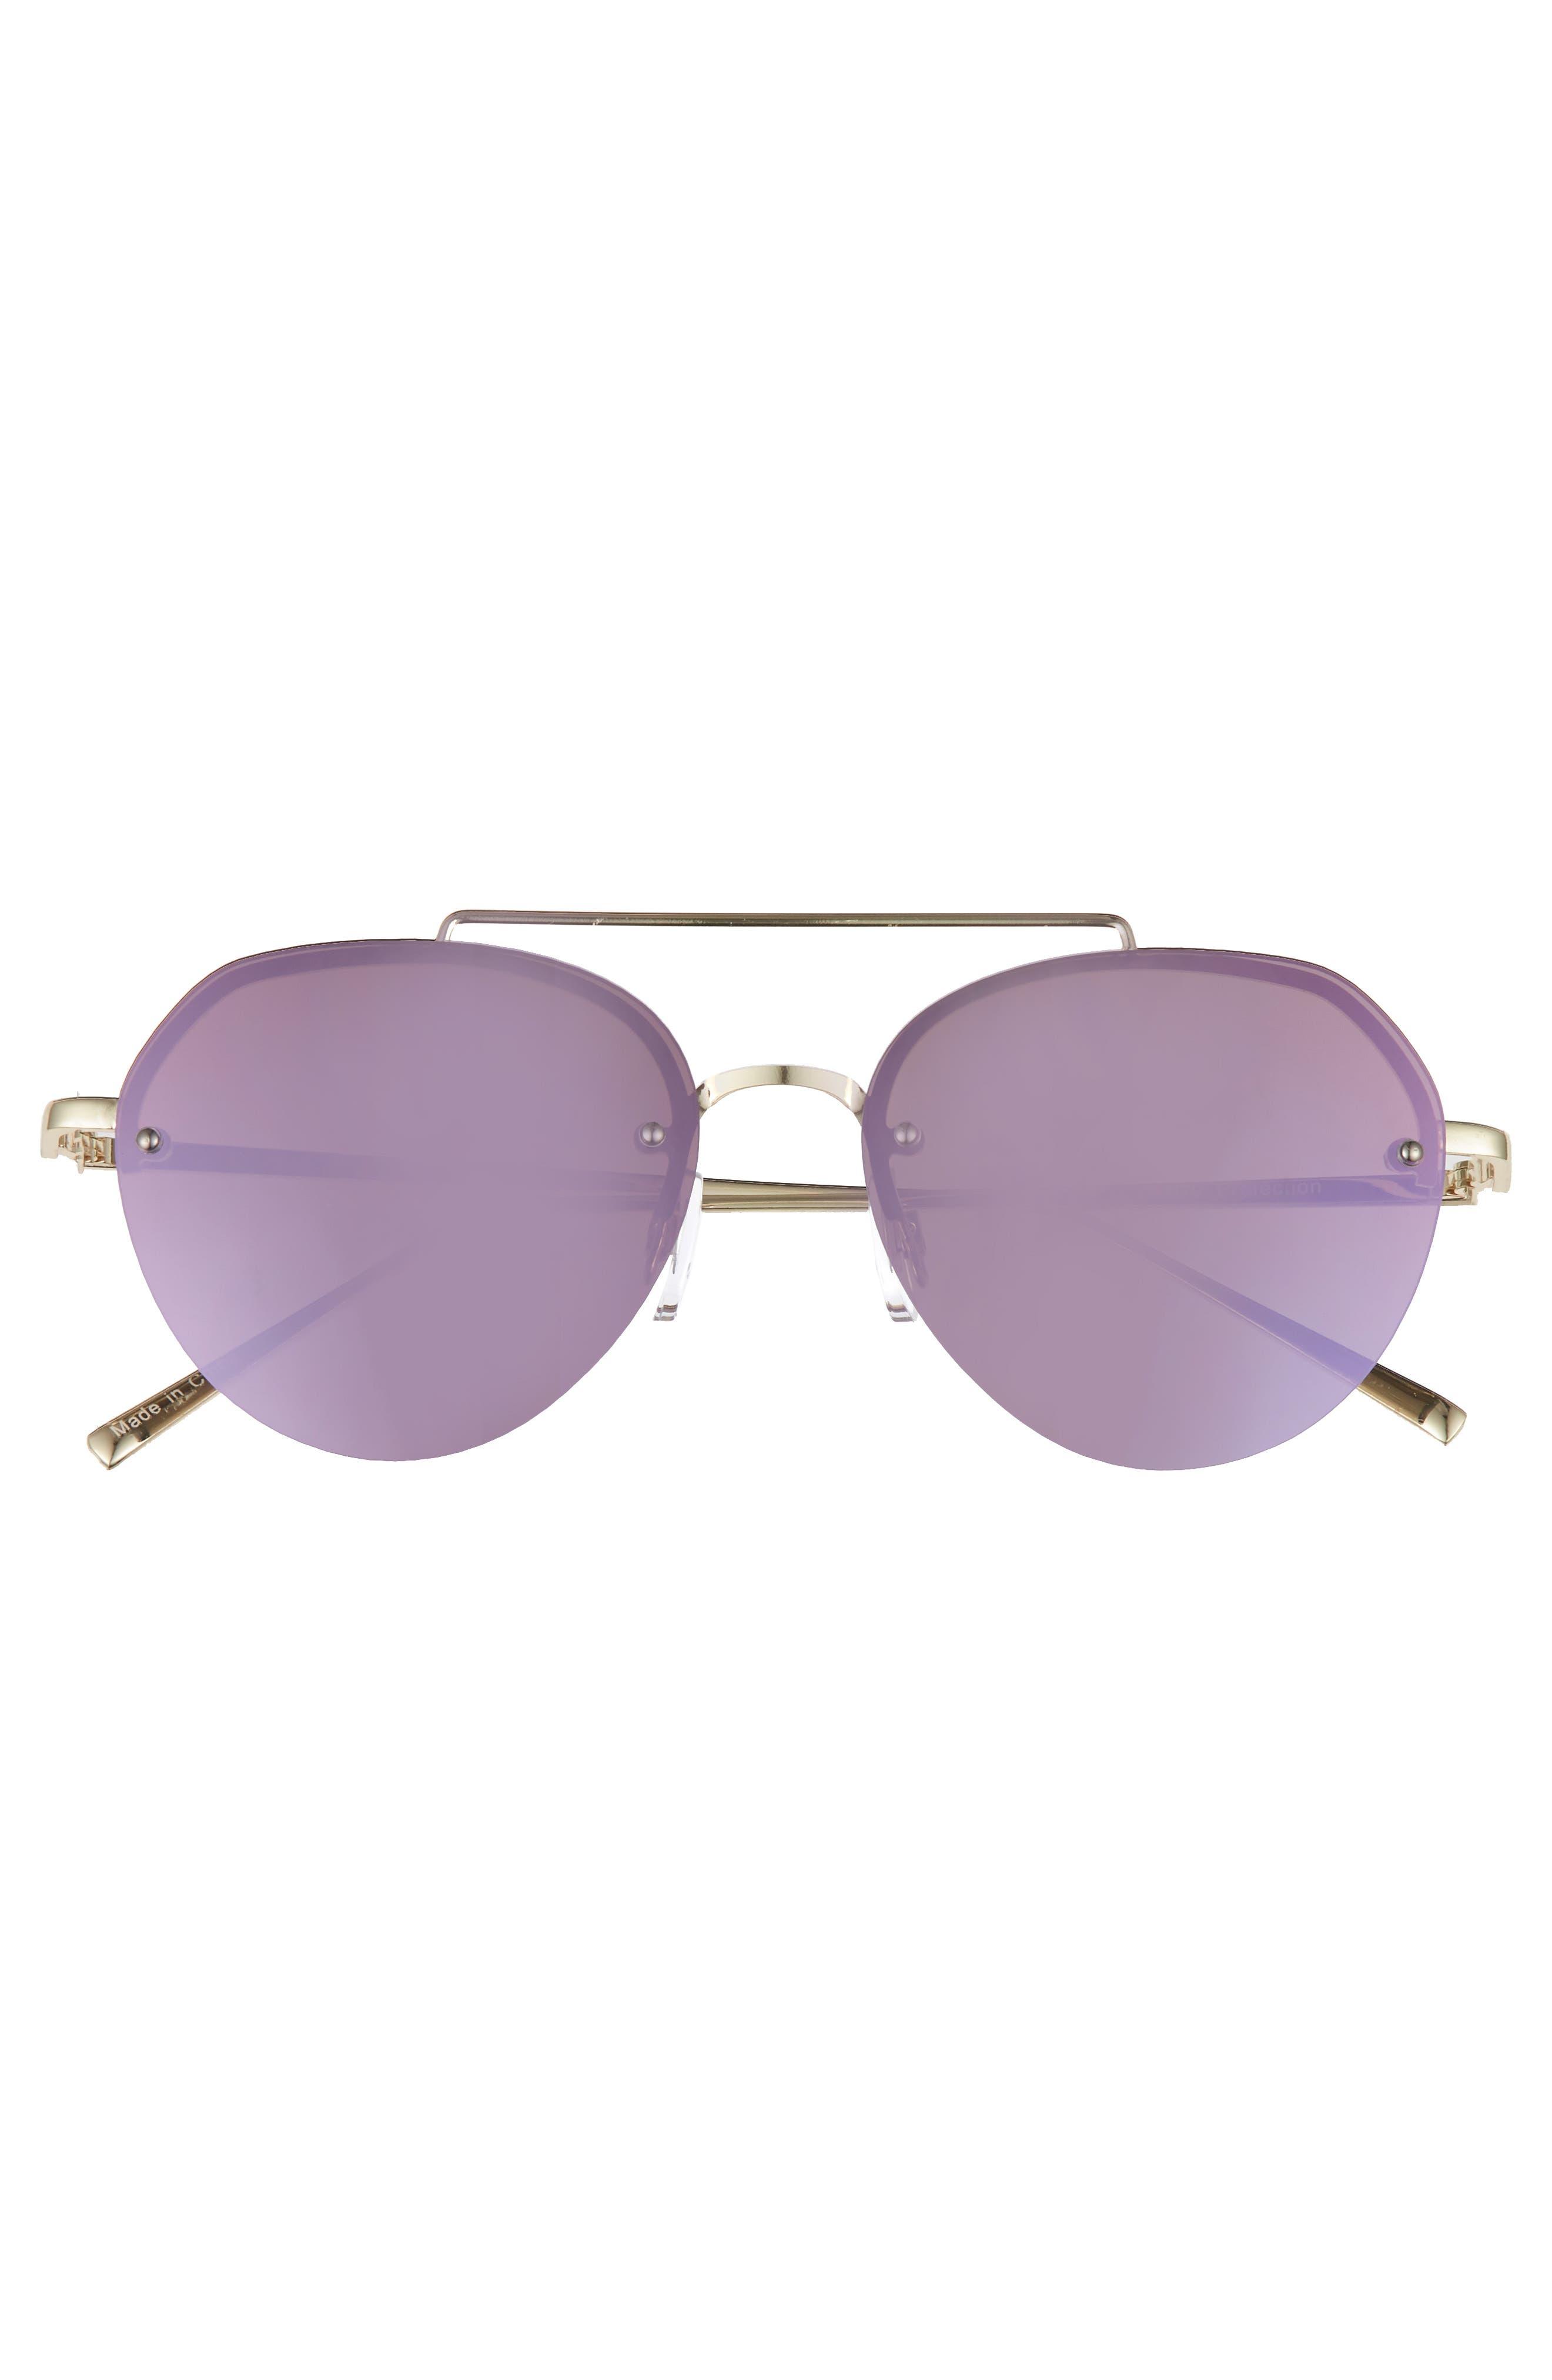 Gradient Petite Aviator Sunglasses,                             Alternate thumbnail 3, color,                             Lavender